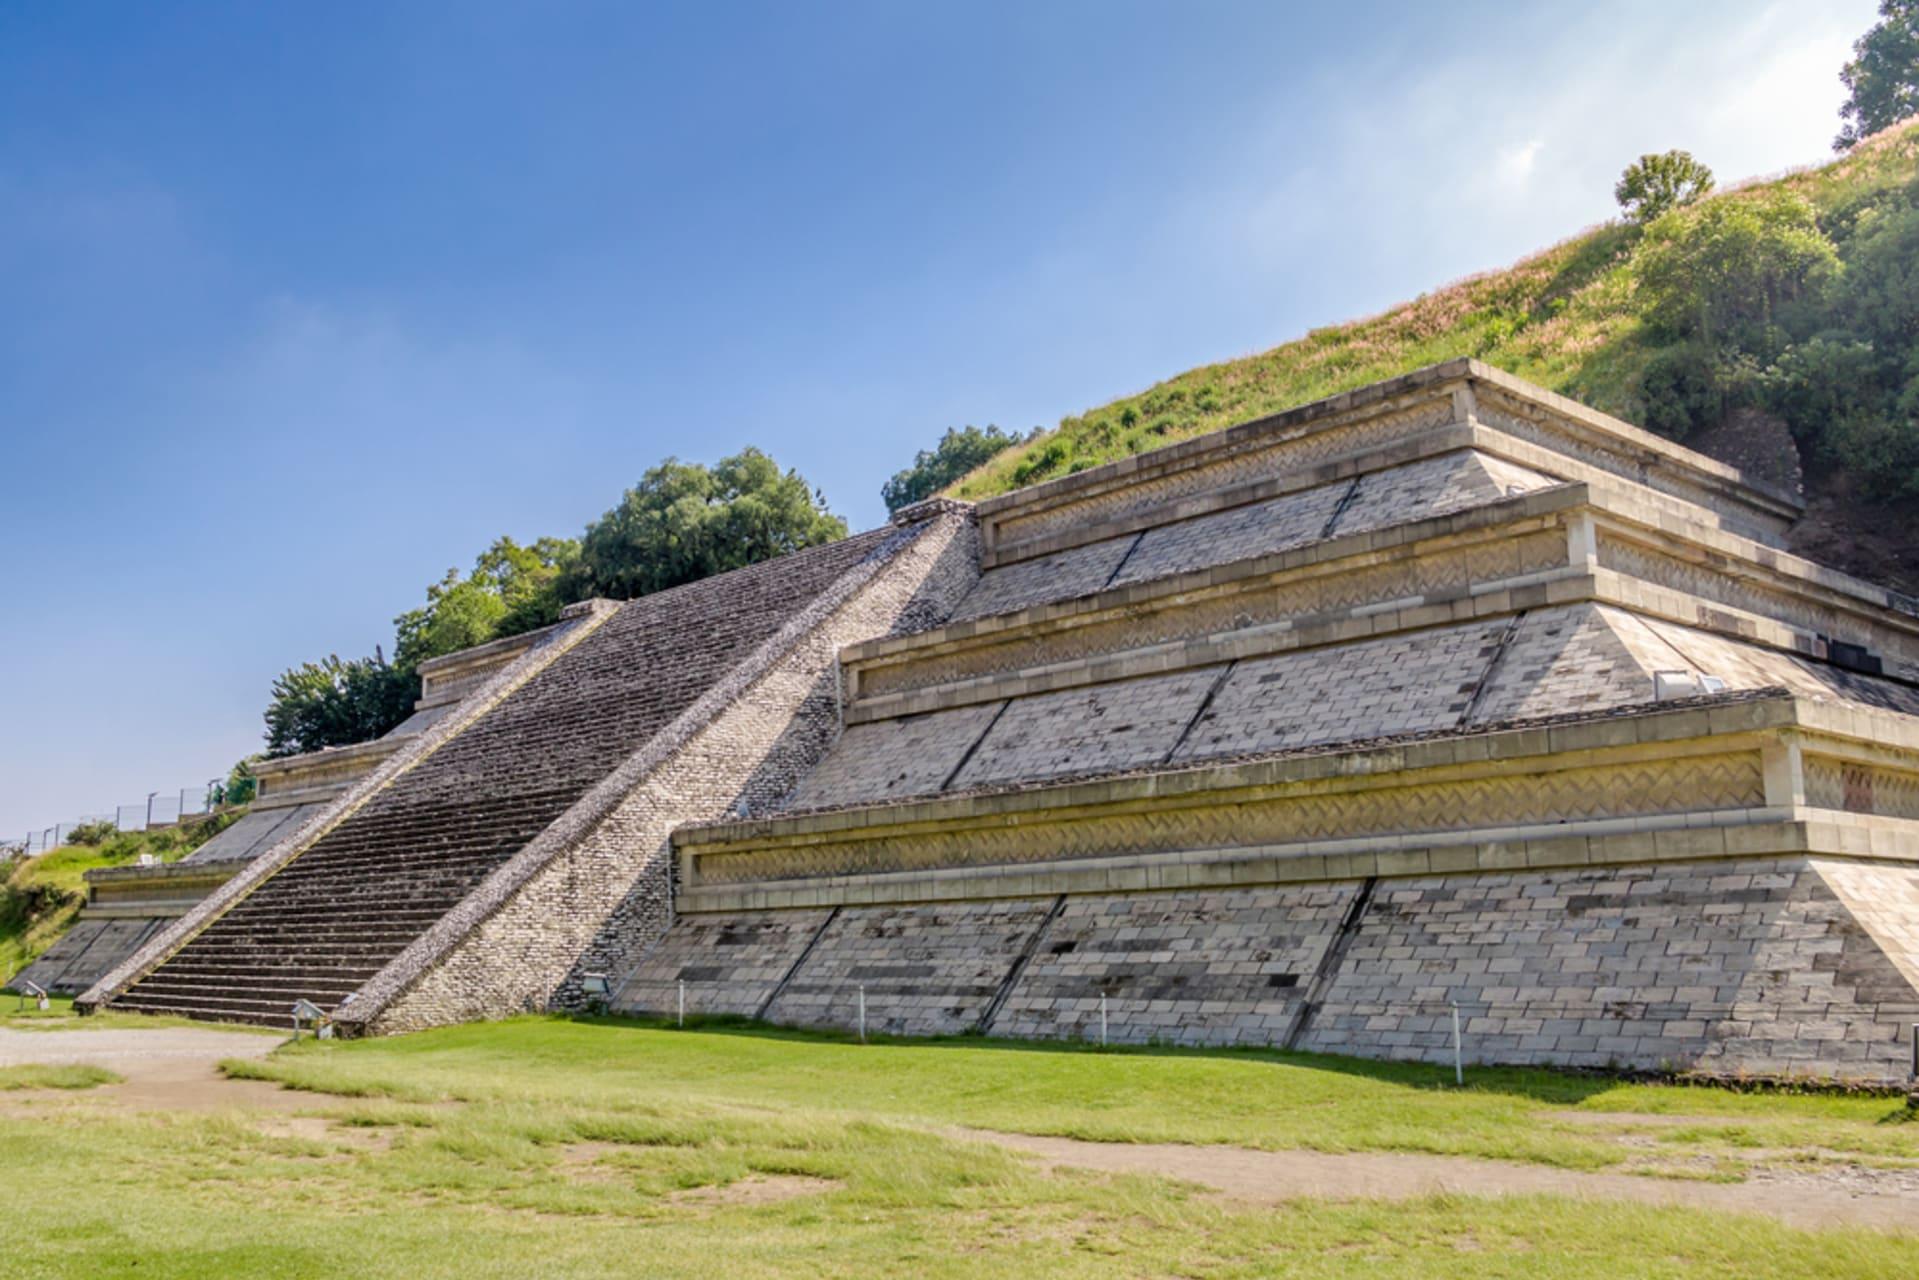 Puebla - The Pyramid of Cholula